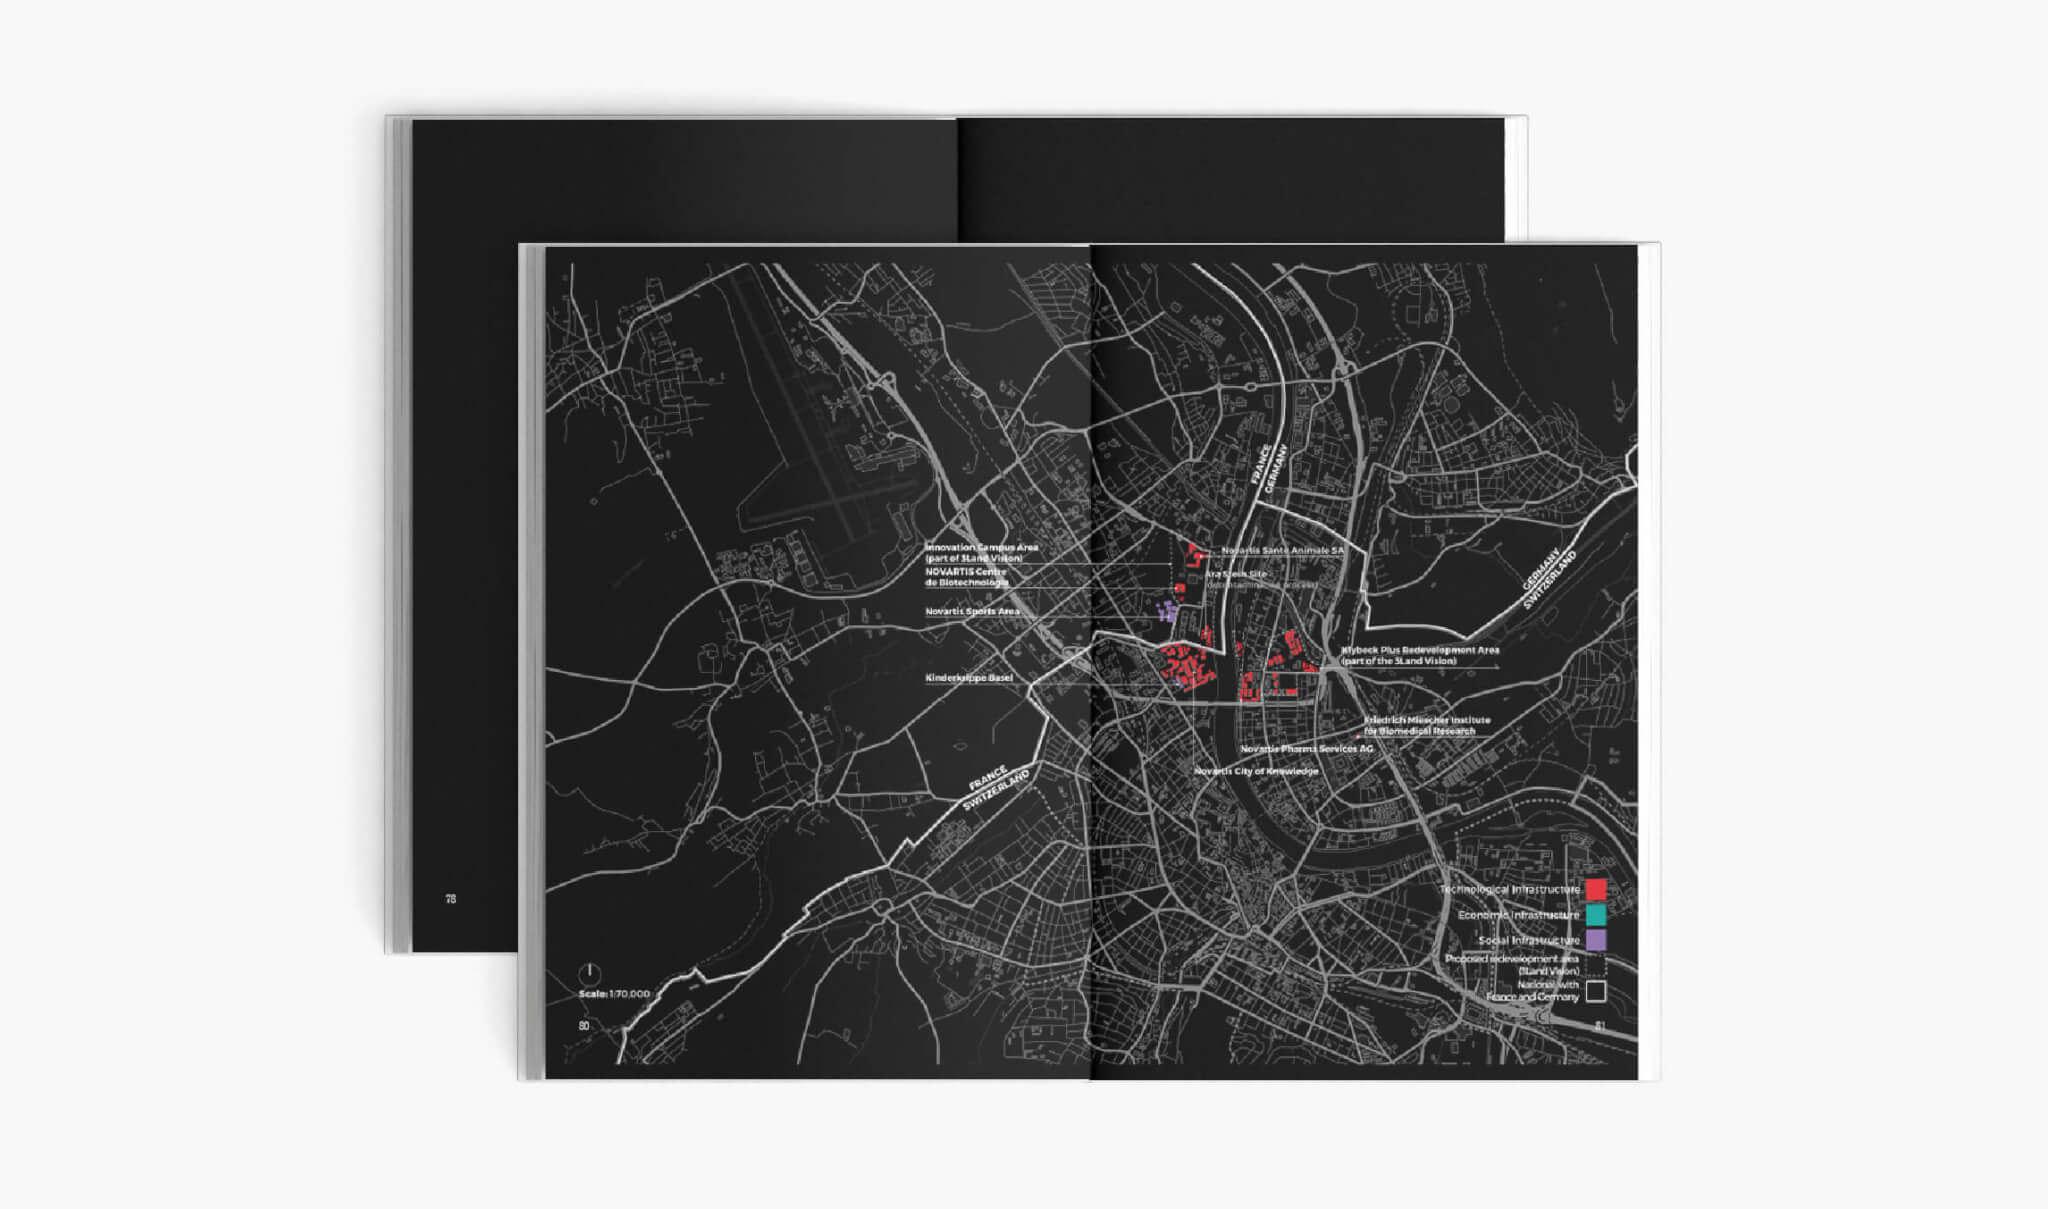 studio-interrobang-corporate-landscapes-mapping8